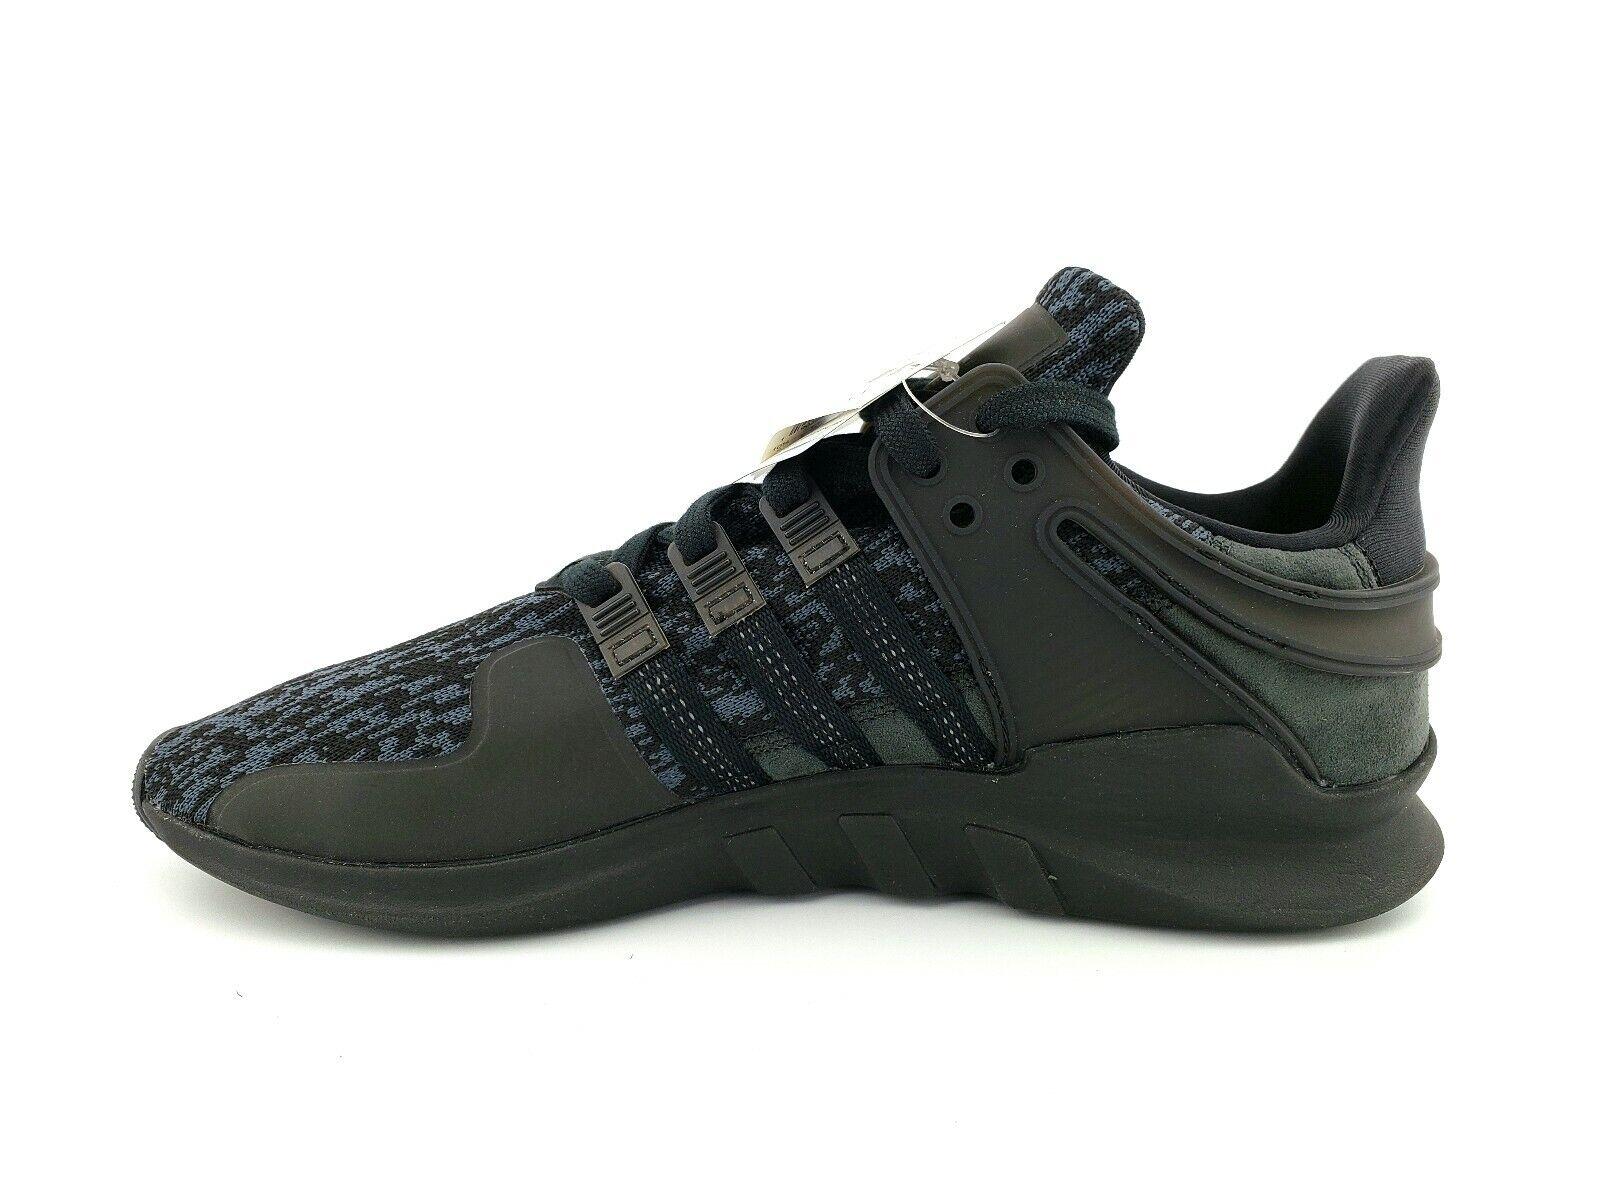 New Men's Adidas Originals EQT Support ADV BY9589 Black-Sub Green Size 10